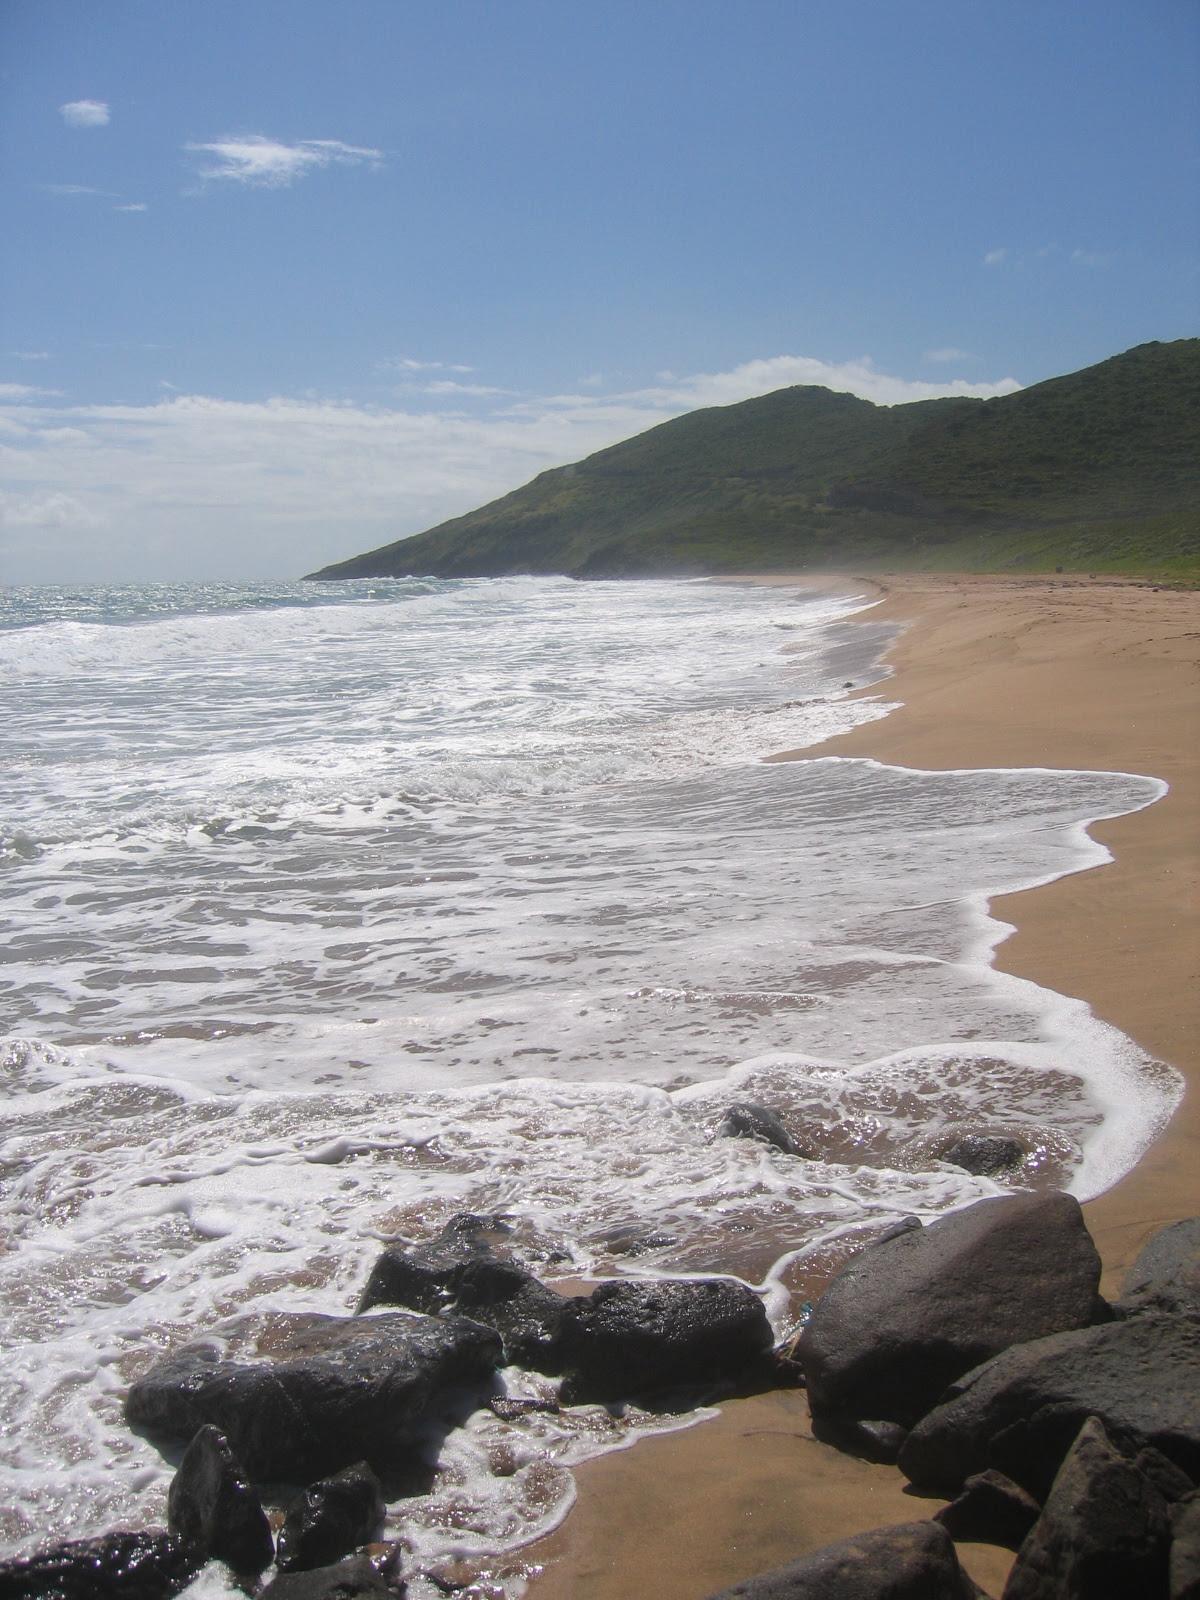 North Friar Beach, St. Kitts